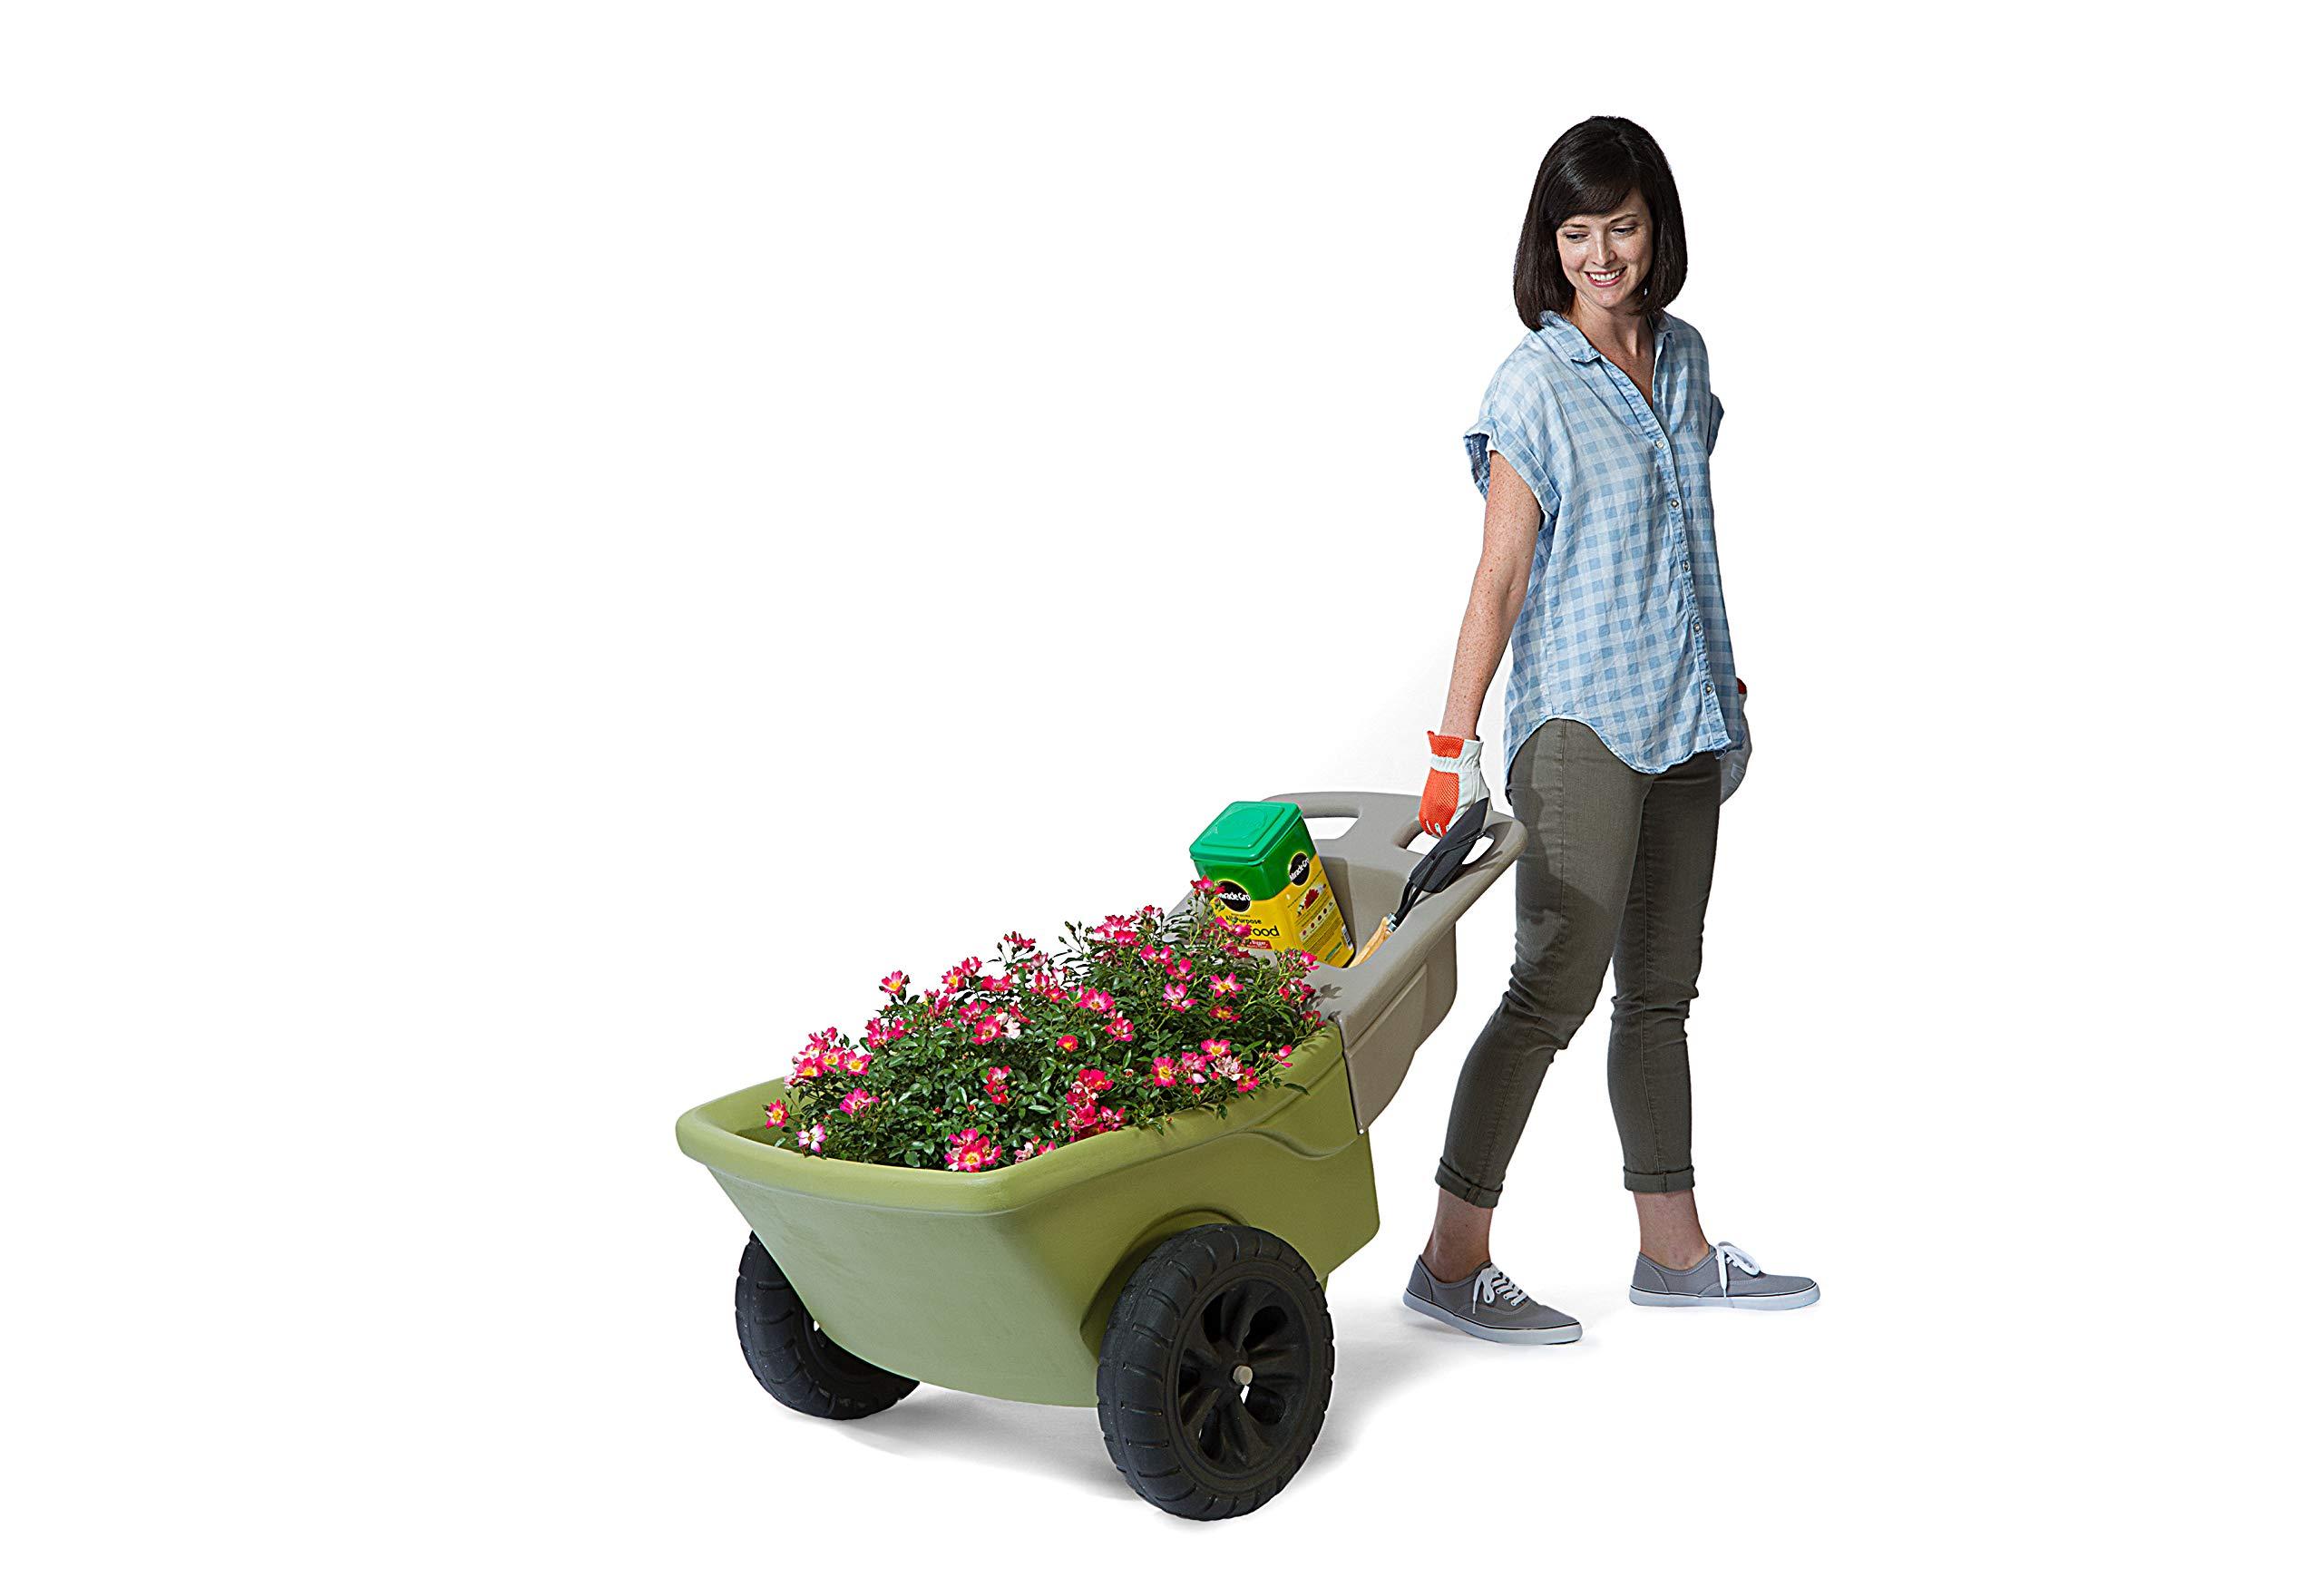 Simplay3 Easy Haul Plastic Wheelbarrow w/Garden Tool Storage Tray, 4 Cubic ft. Capacity, 2 Wheels - Green by Simplay3